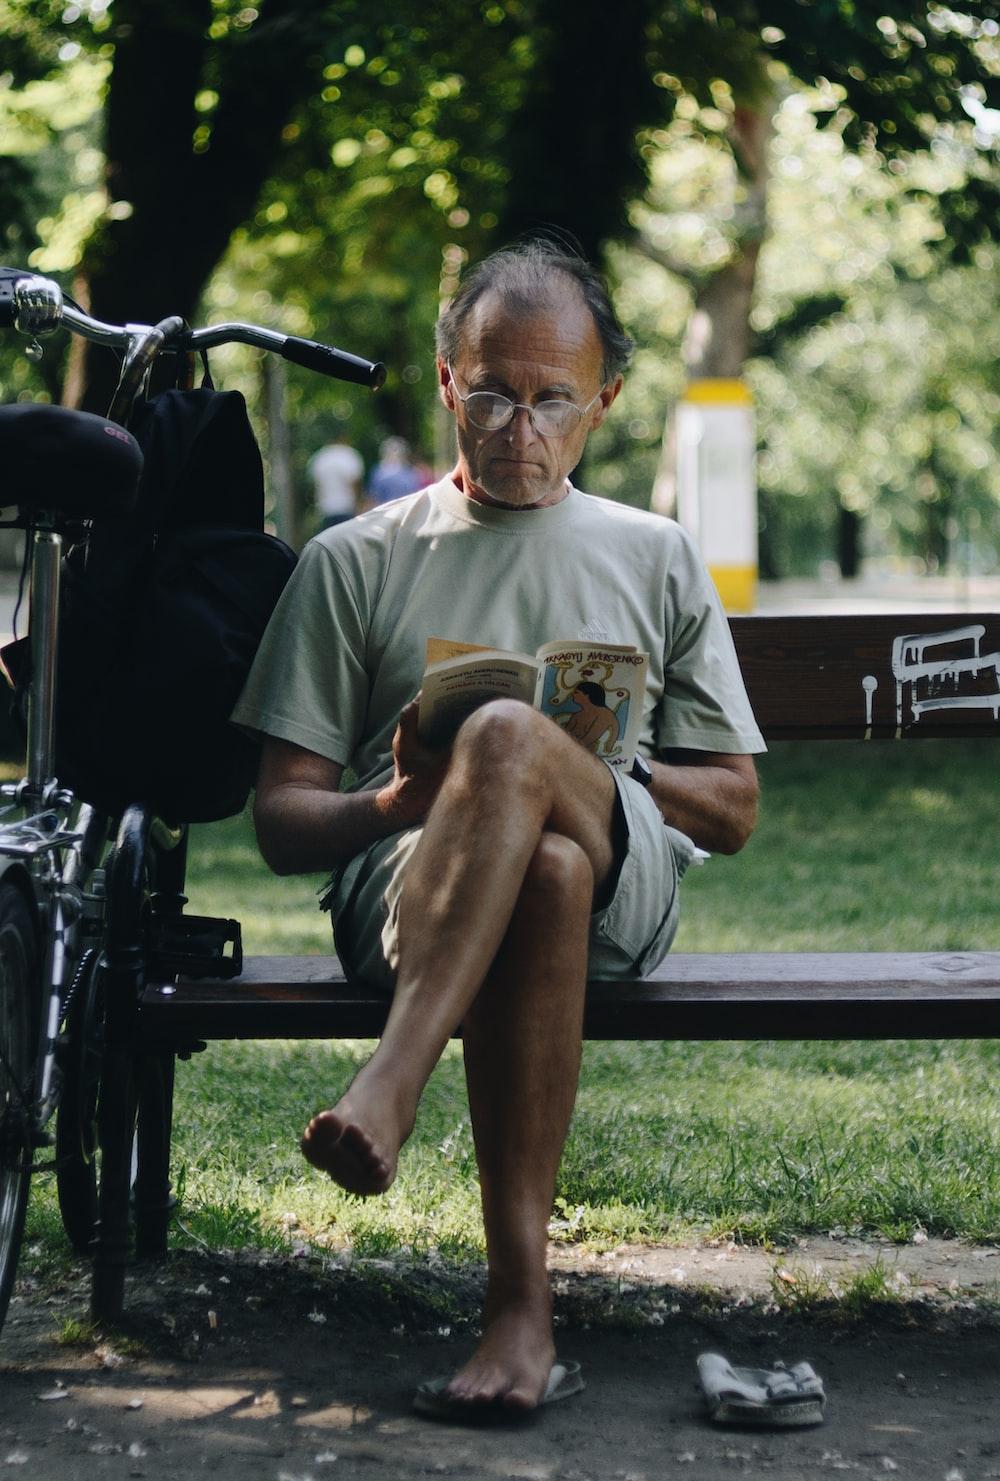 man in brown crew neck t-shirt sitting on black wooden bench during daytime